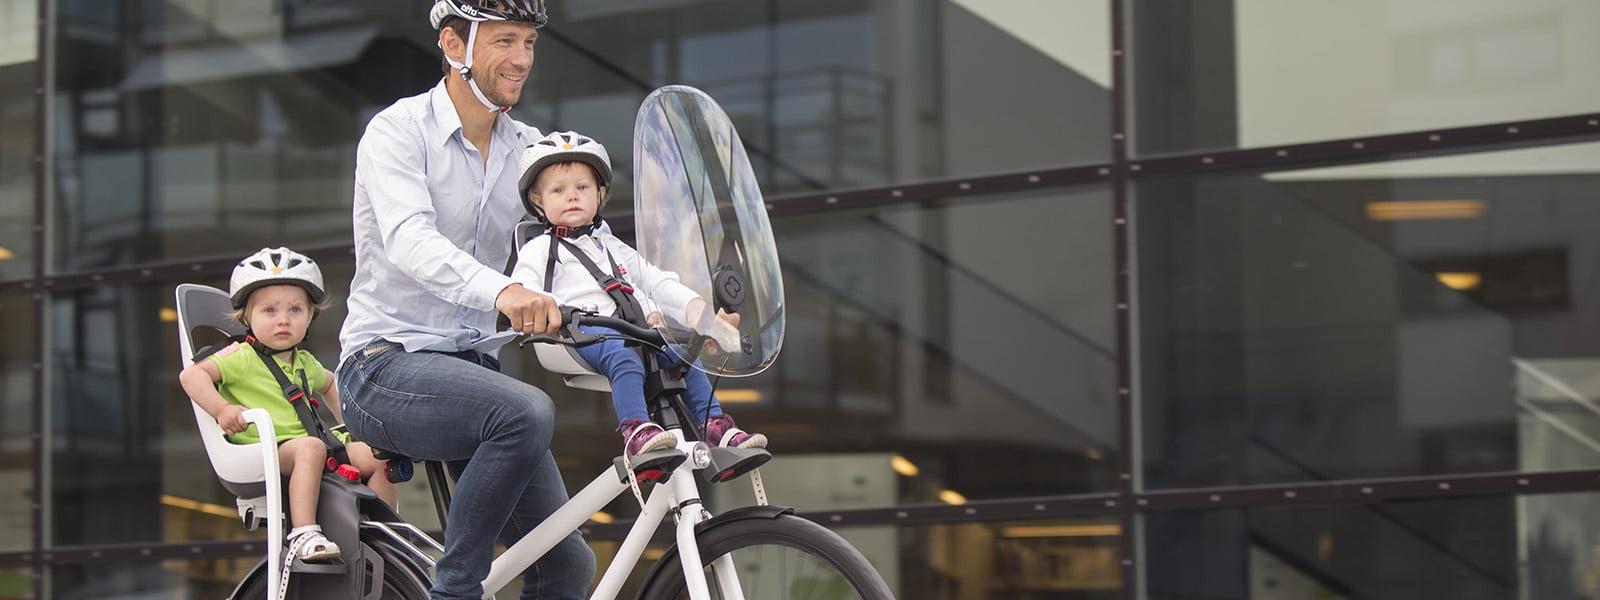 Hamax caress child bike seat and observer frontmounted child bike seat